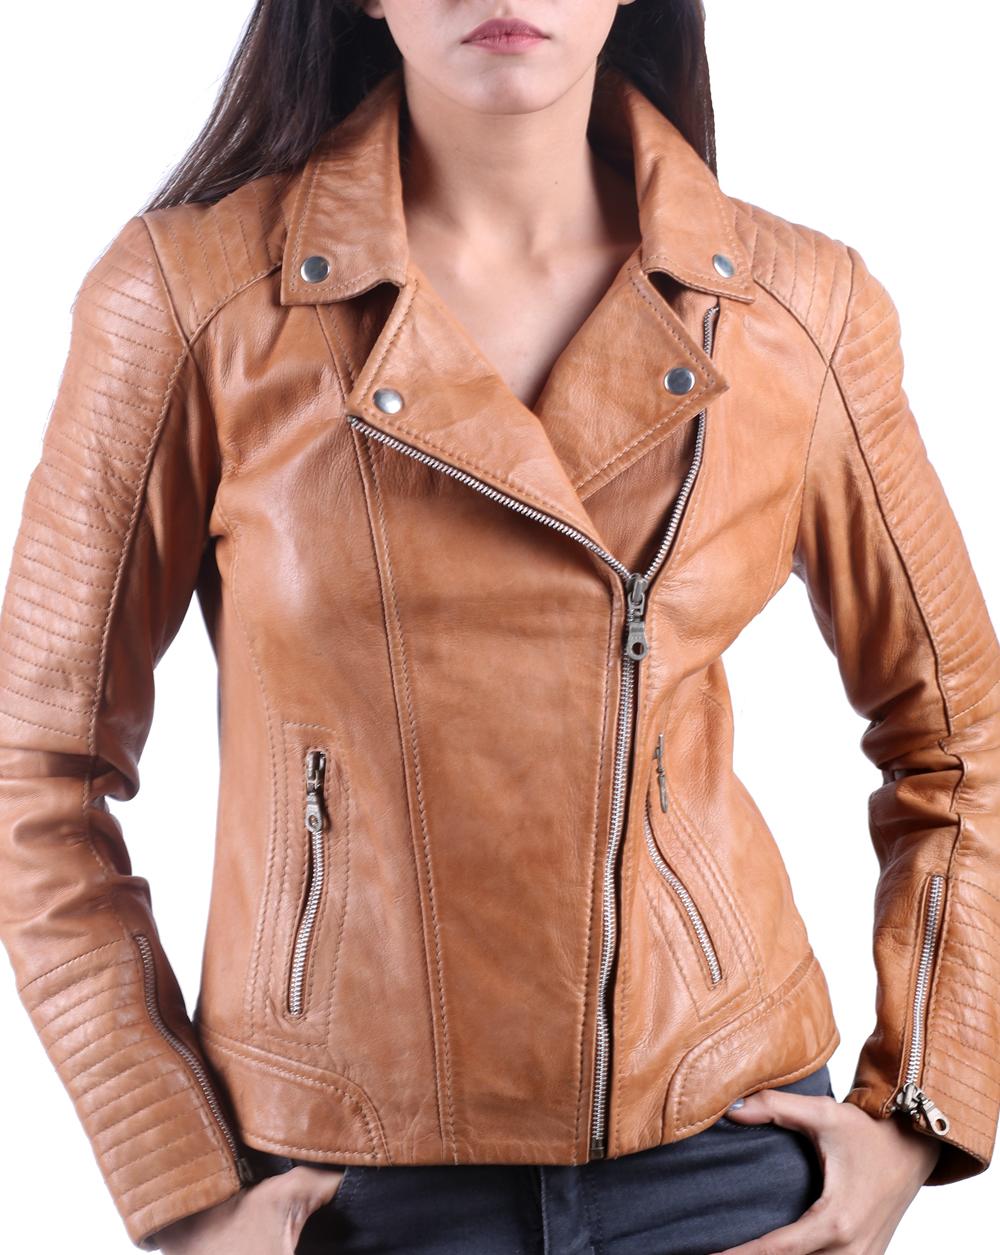 Risultati immagini per Mila Kunis Biker Leather Jacket